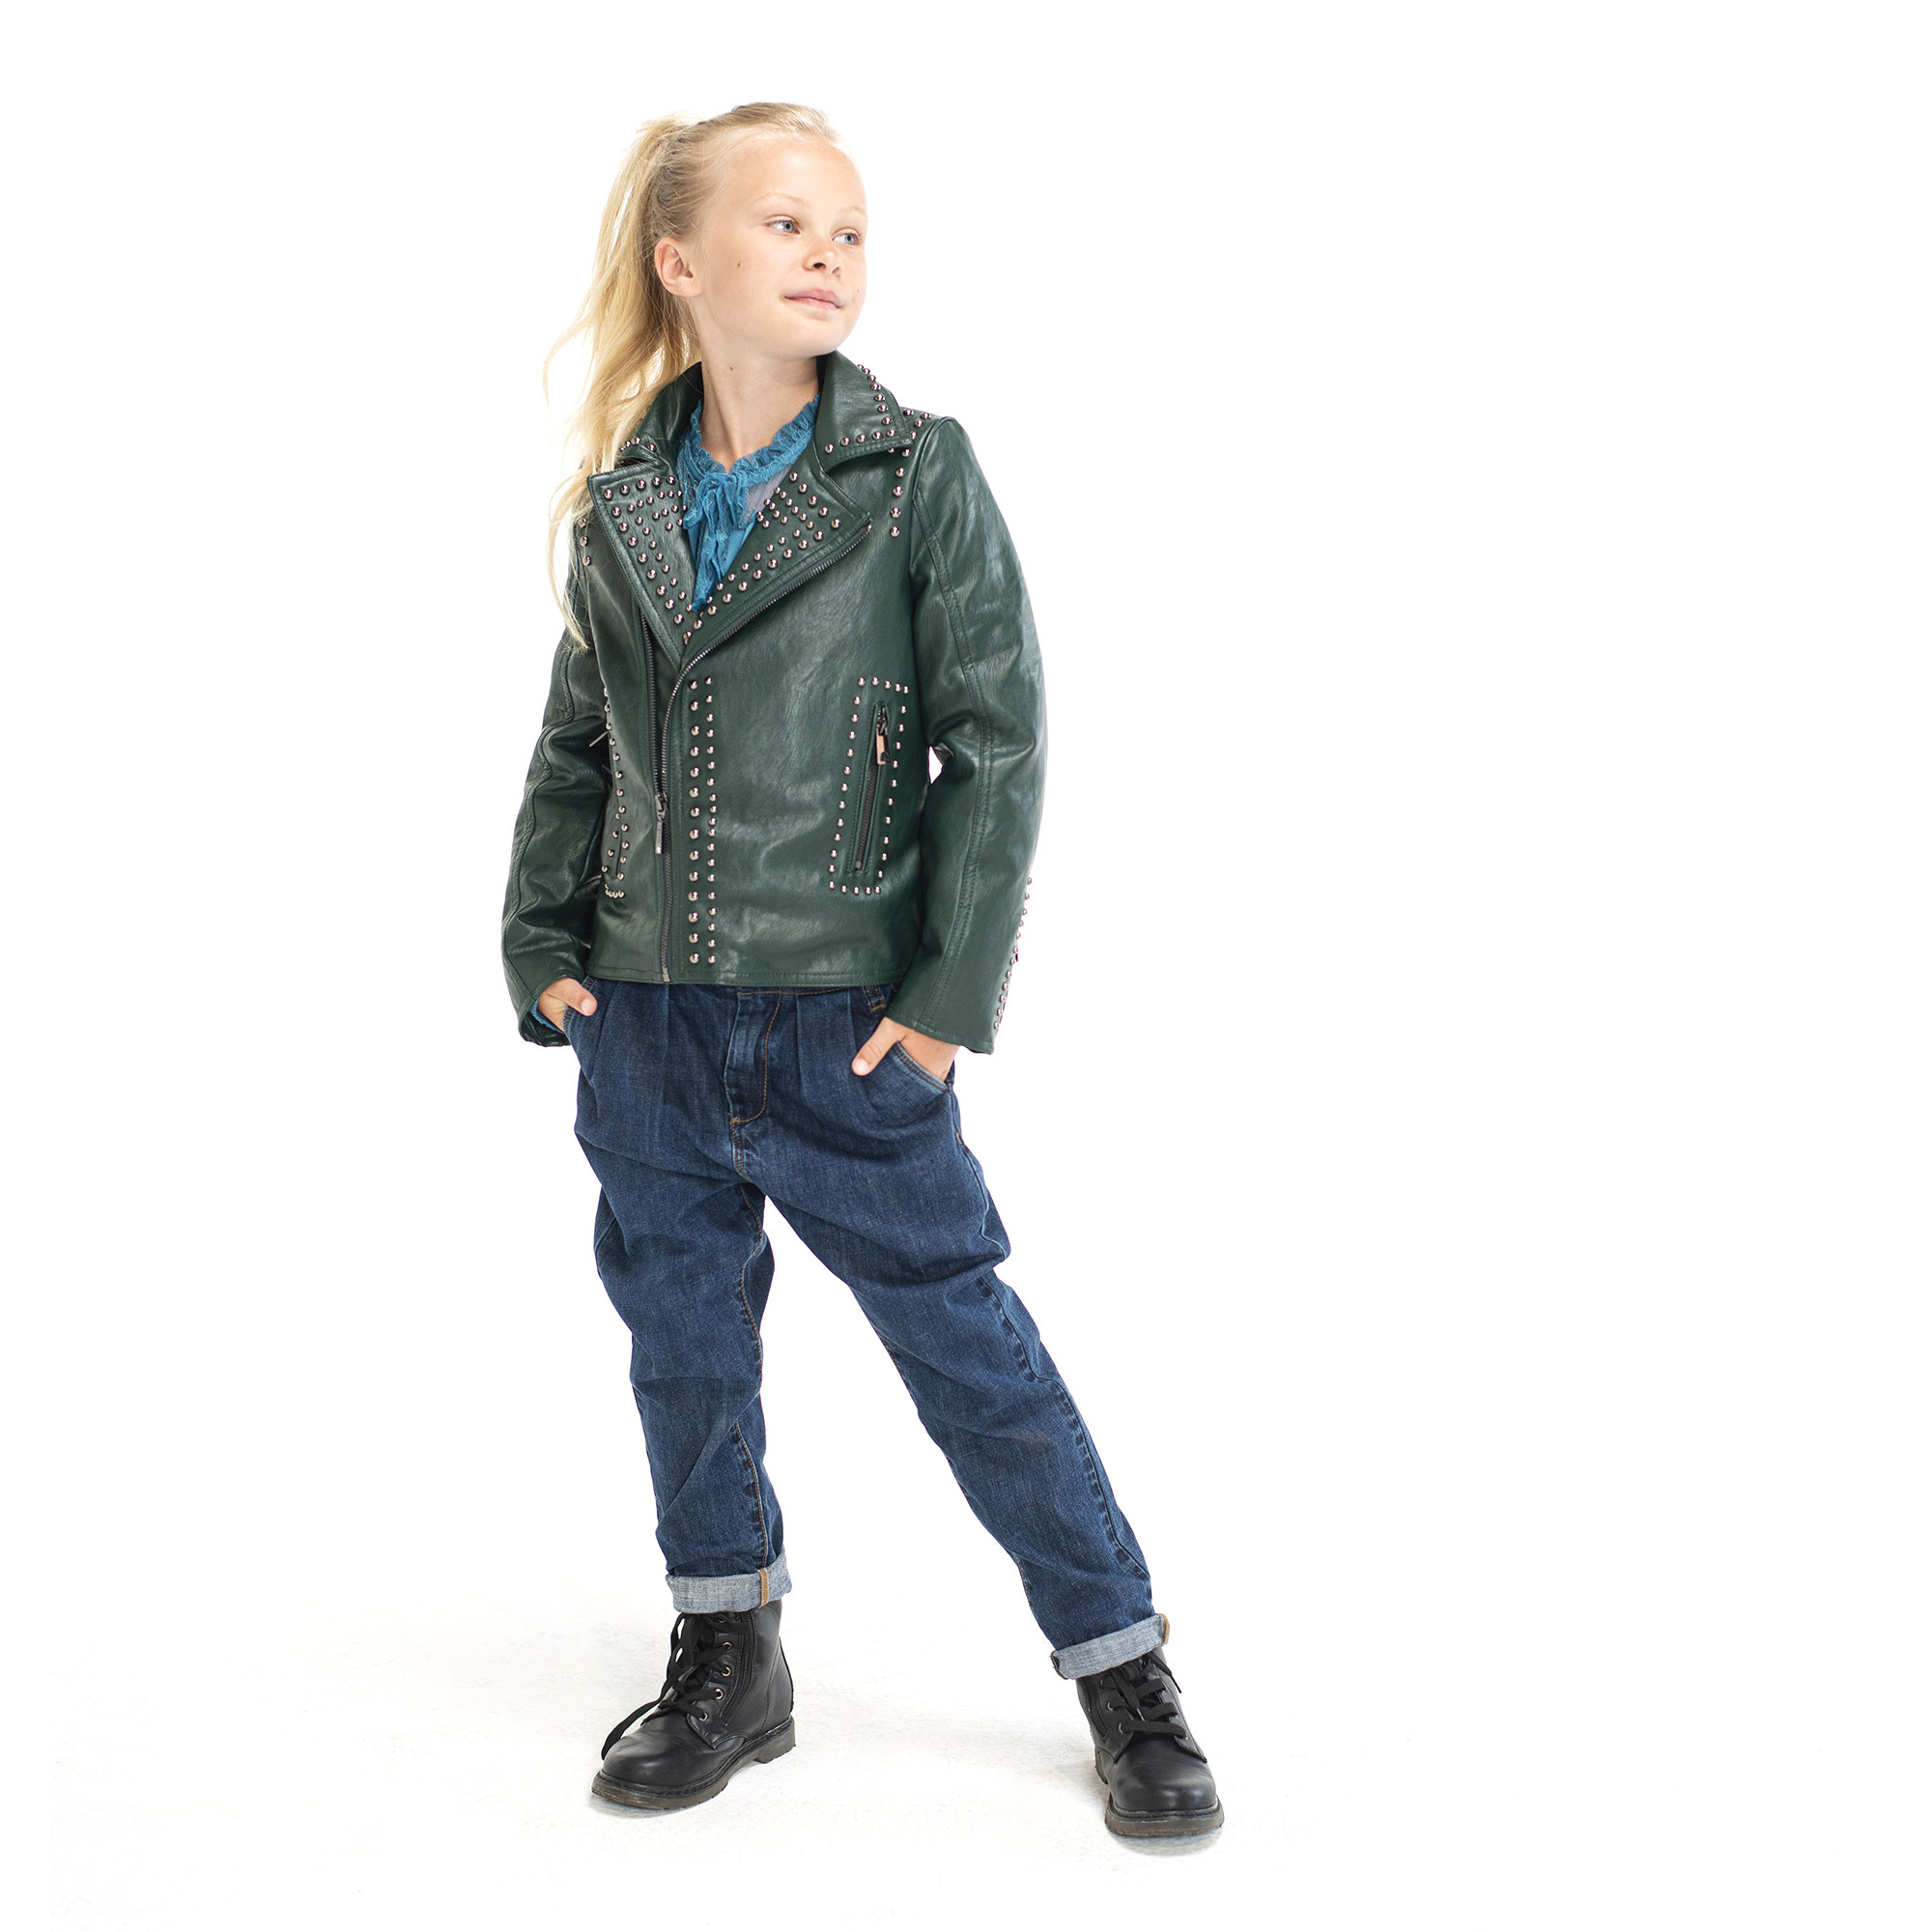 los angeles 4ad5f 713b2 Giubbotti e giacche Bambina 3-16 Anni   Nucleo Kids Shop